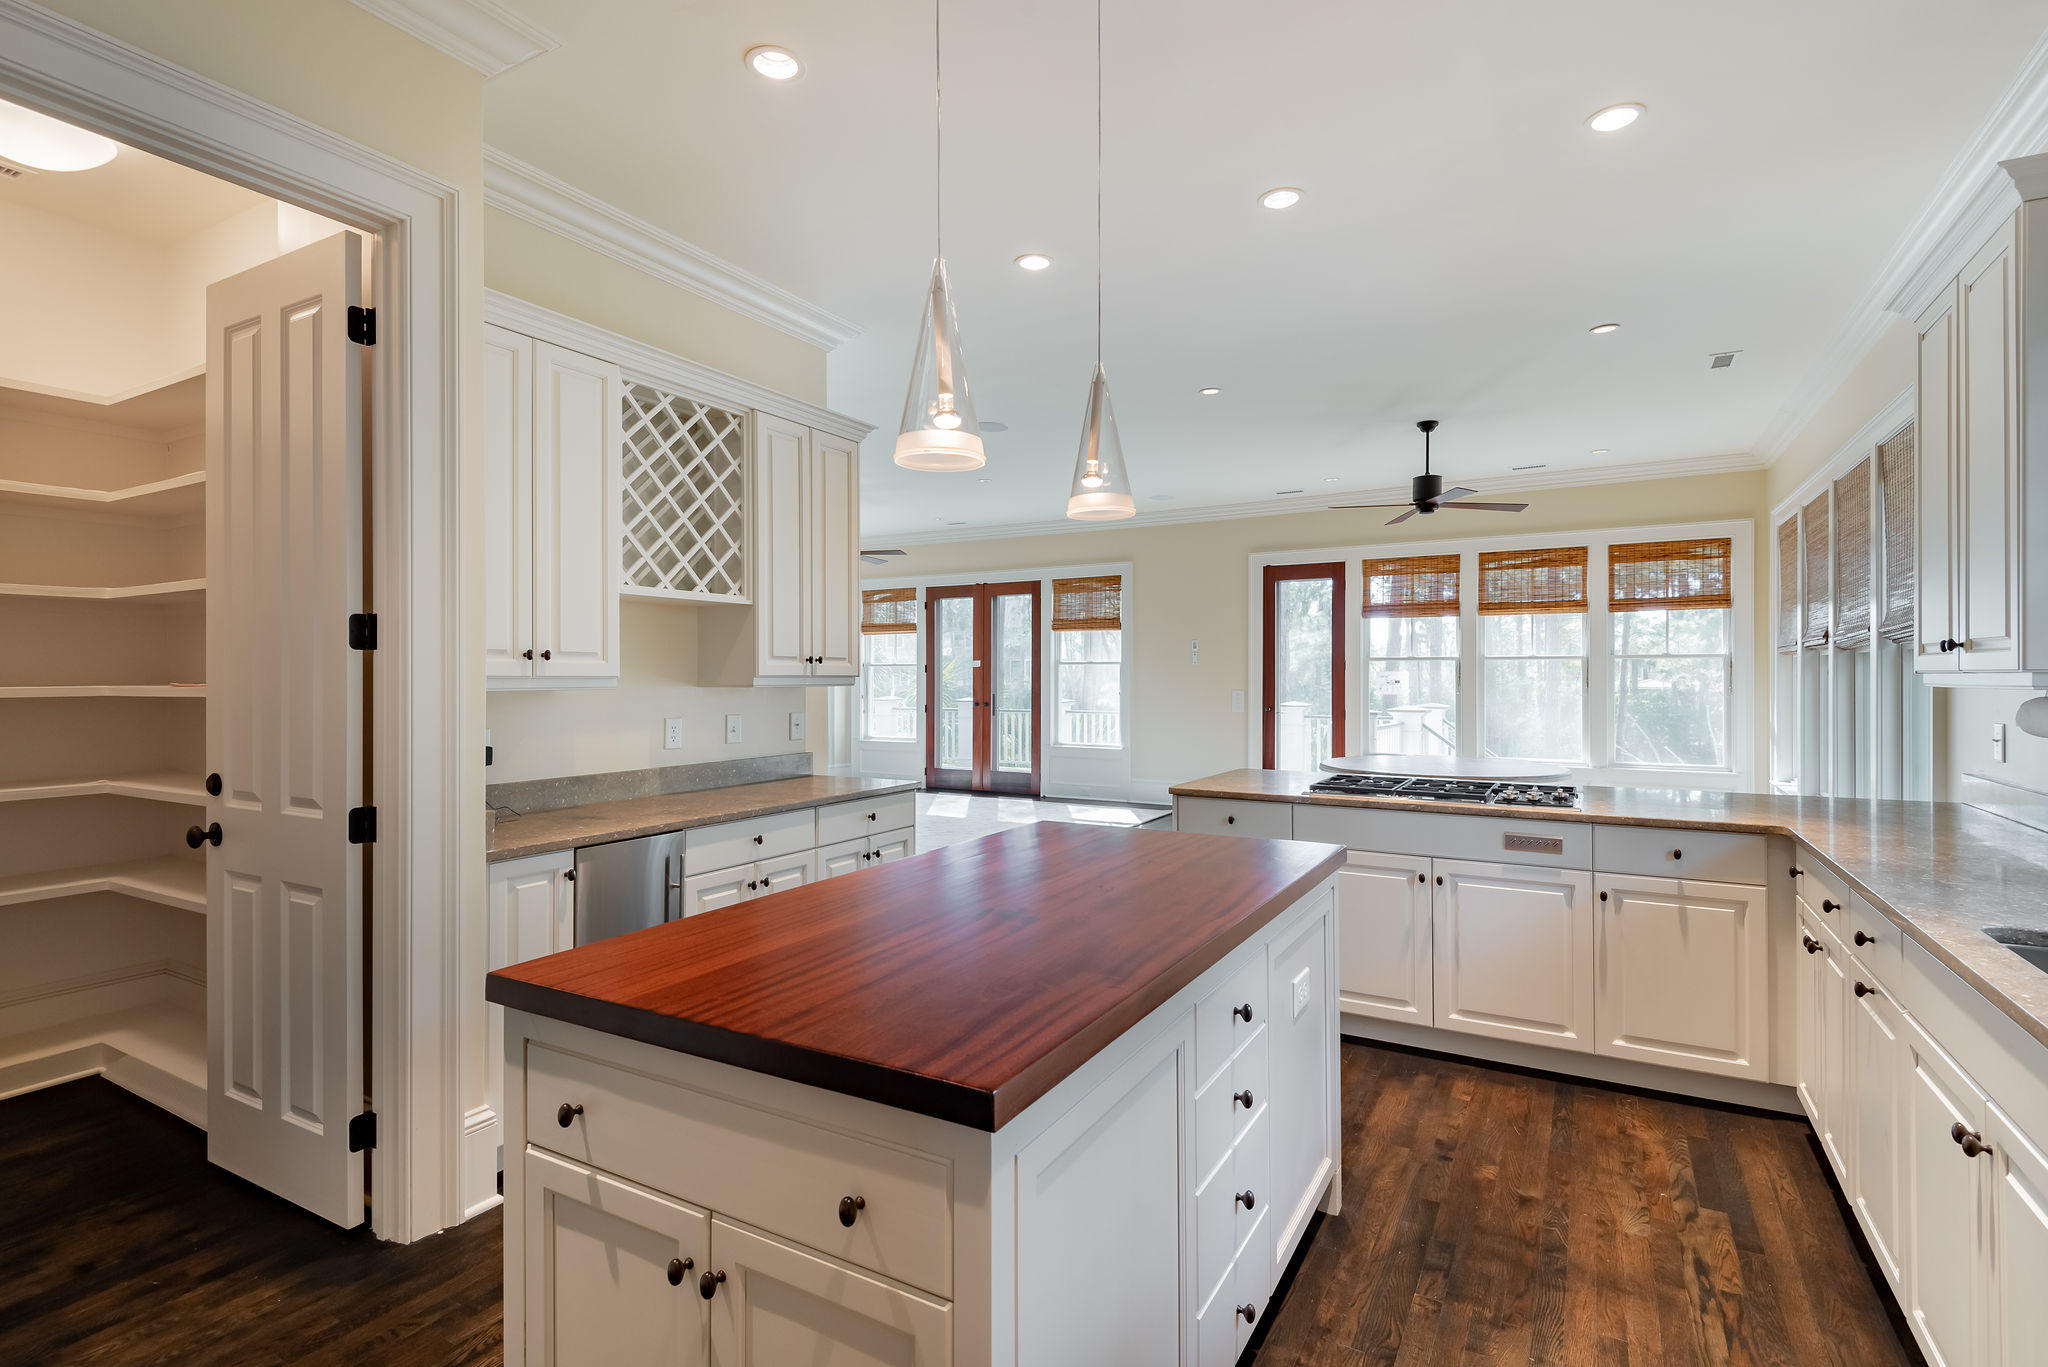 Kiawah Island Homes For Sale - 3 Grey Widgeon, Kiawah Island, SC - 54